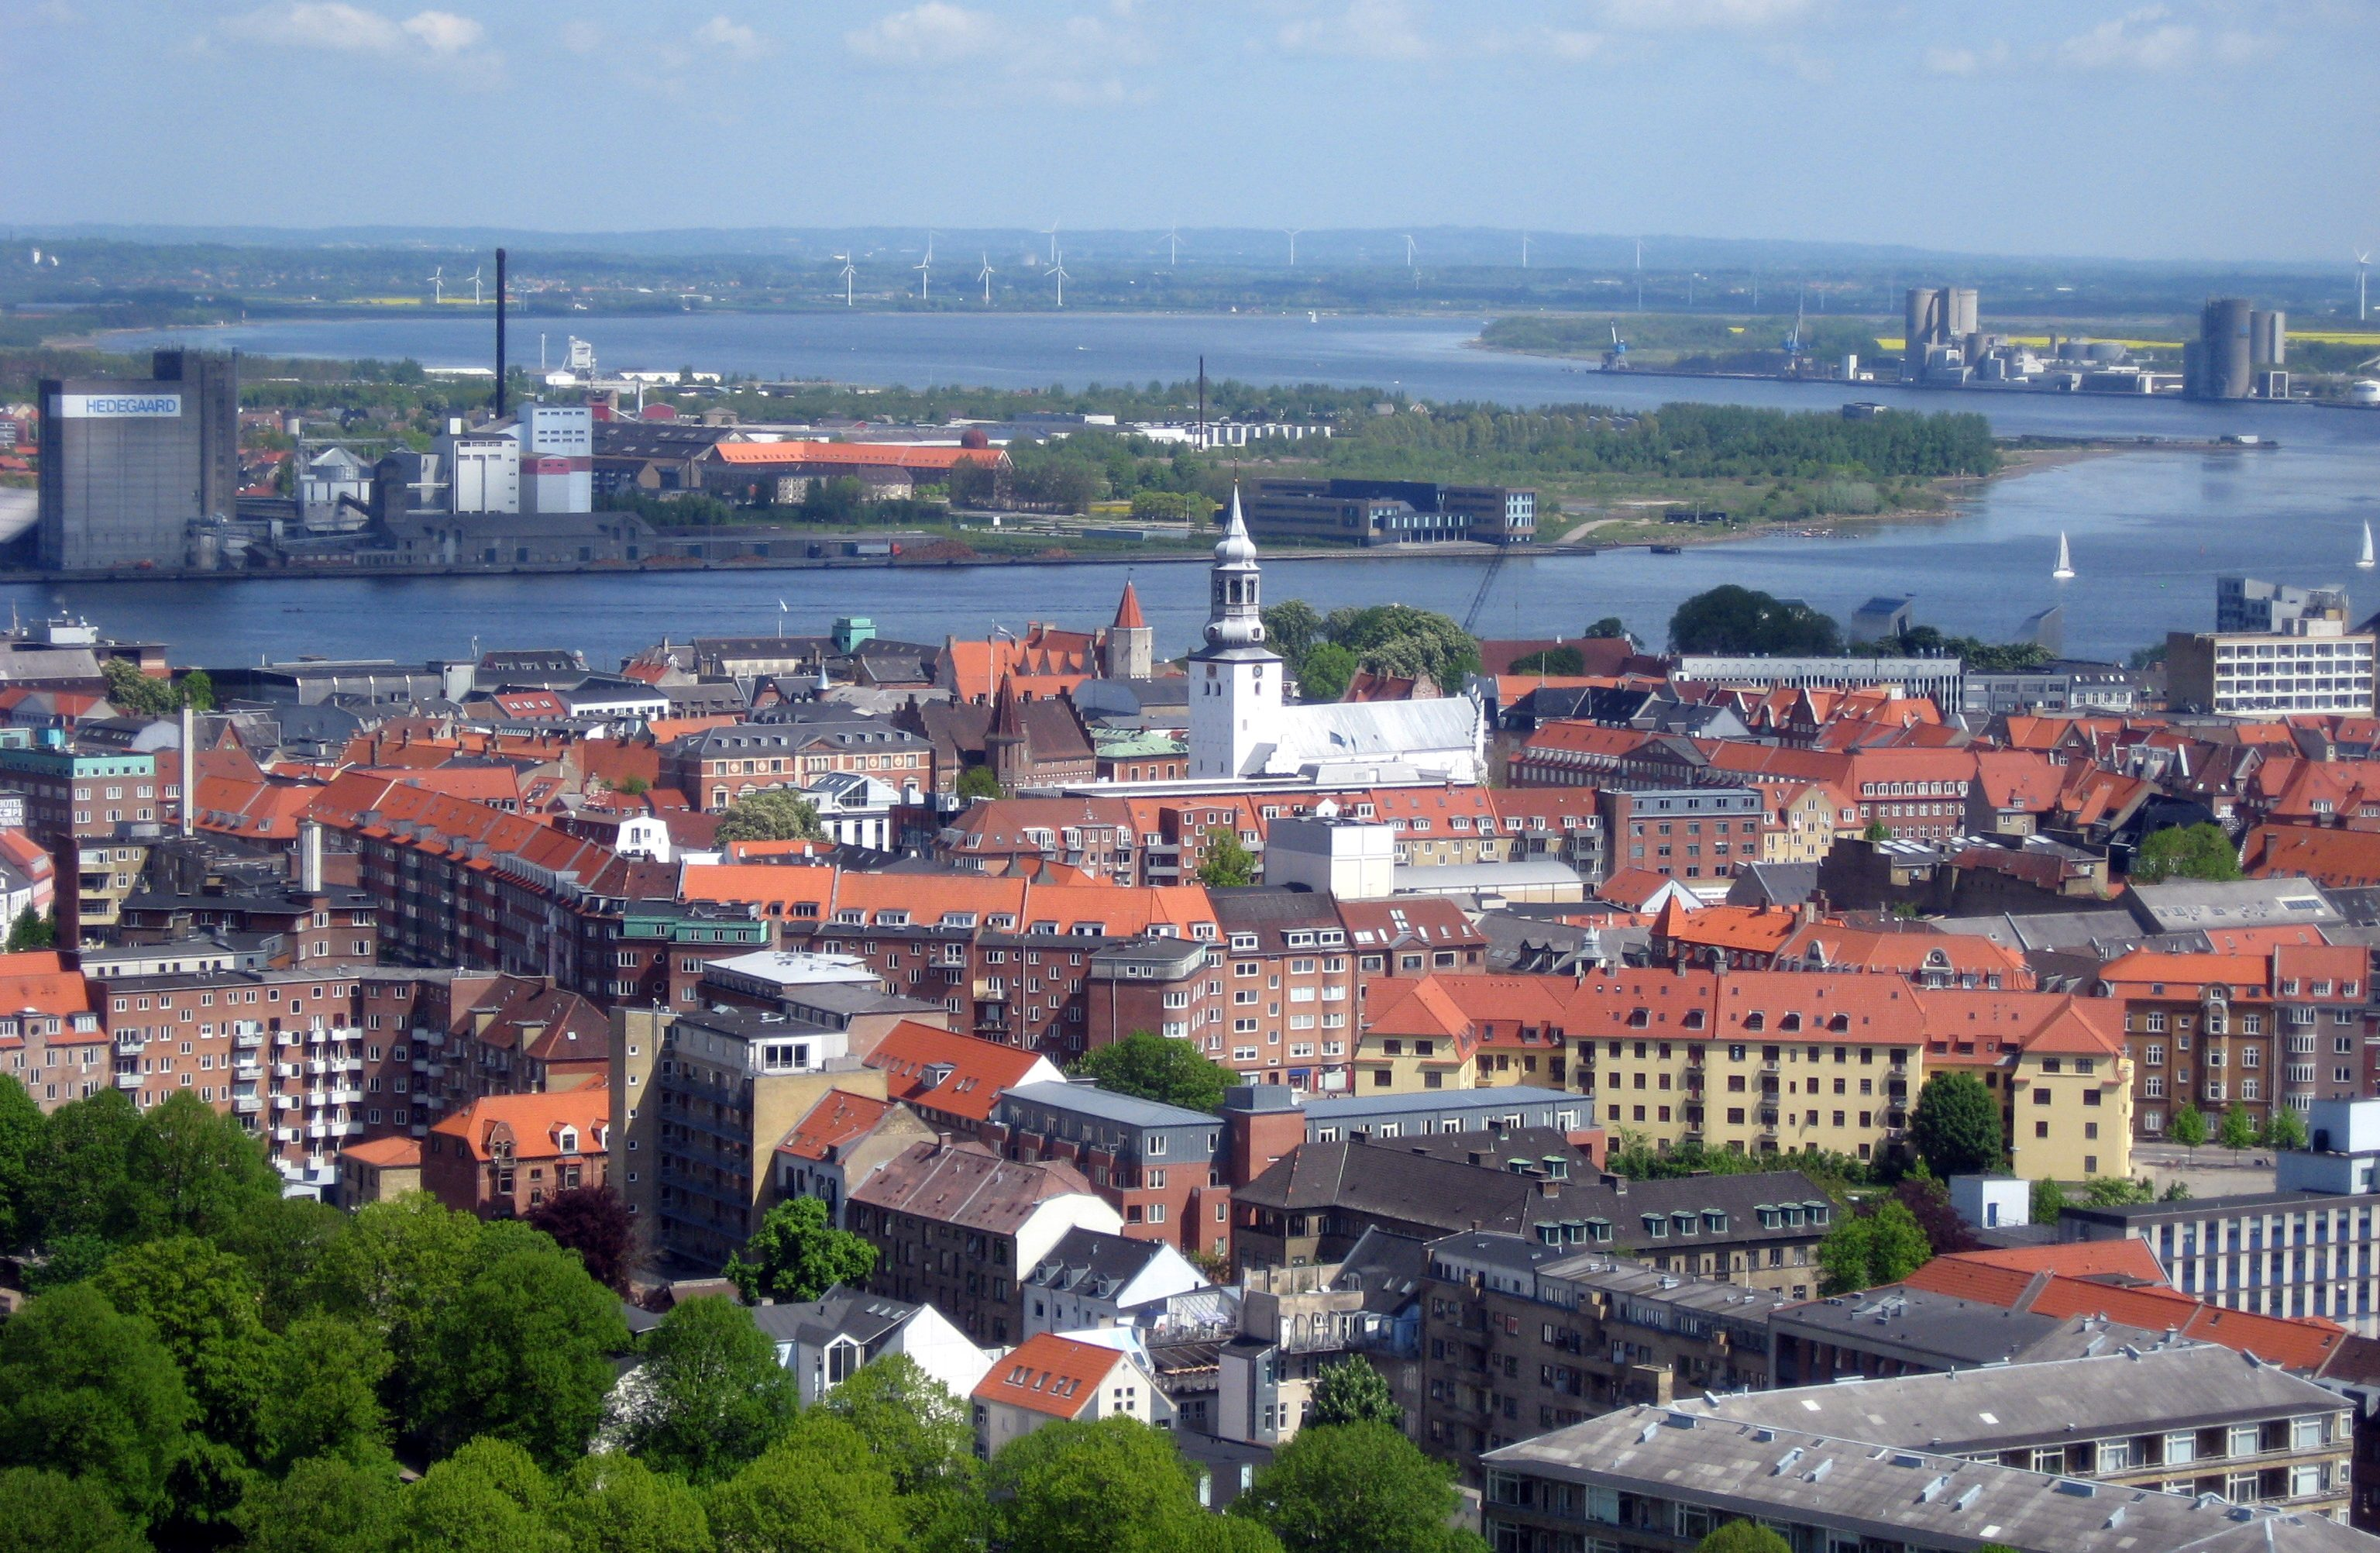 Aalborg er blandt de fem mest bæredygtige byer i verden. Foto: Tomasz Sienicki, CC 3.0